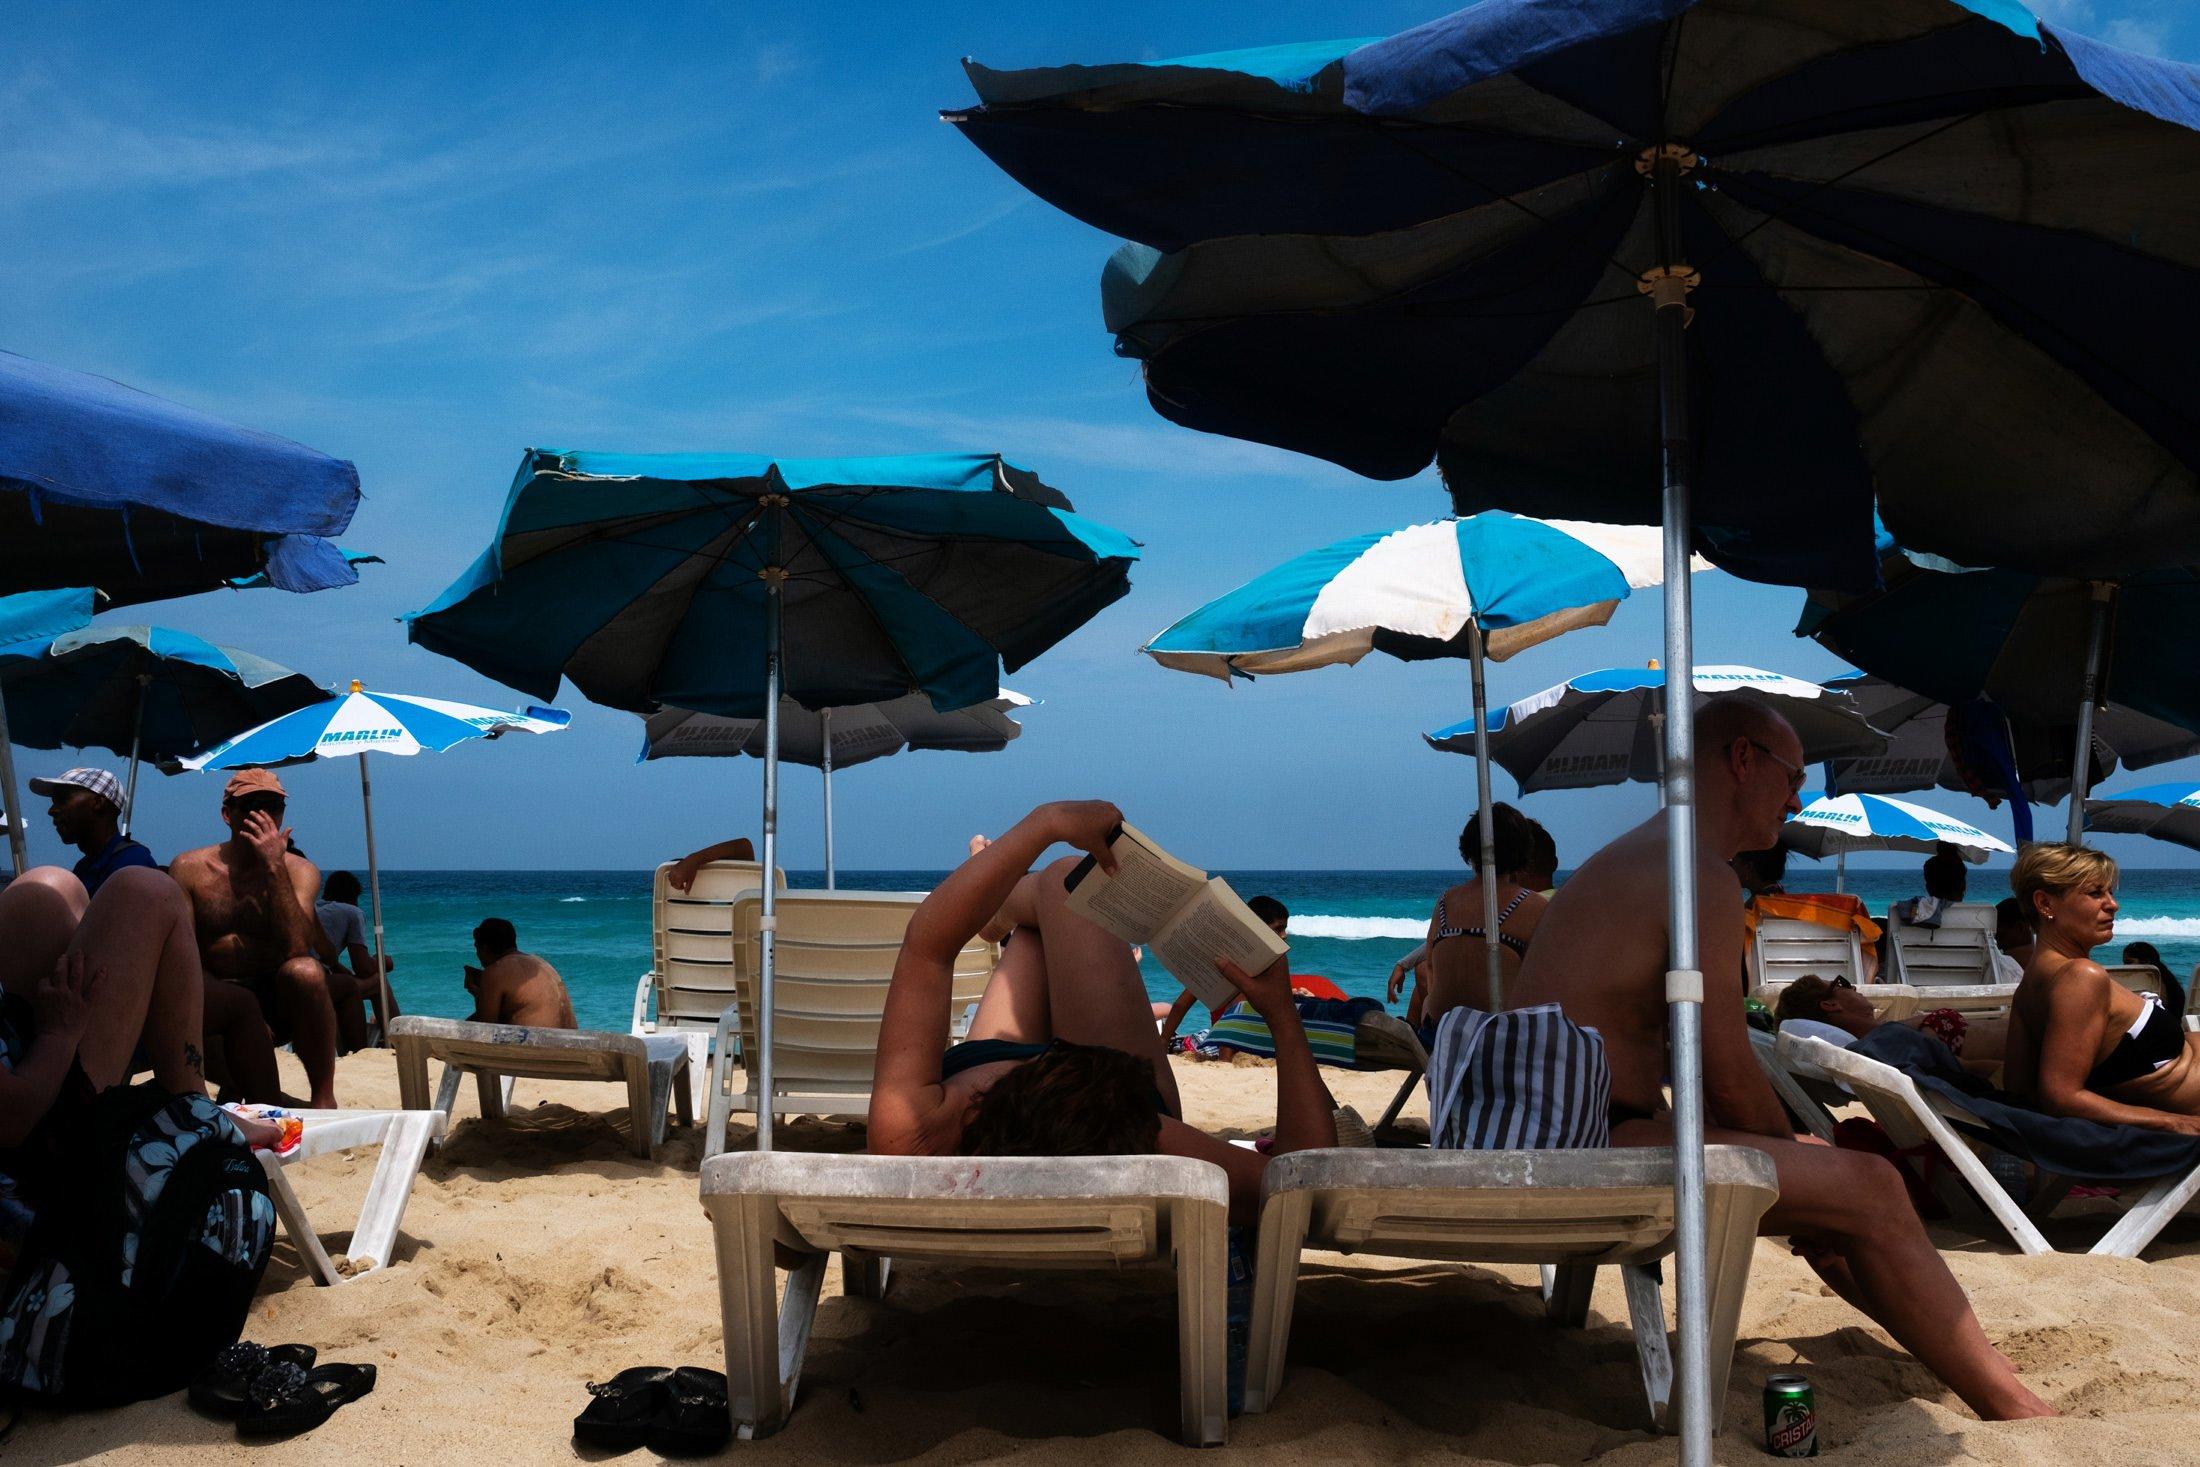 sun worshiping on a beach in Trinidad, Cuba